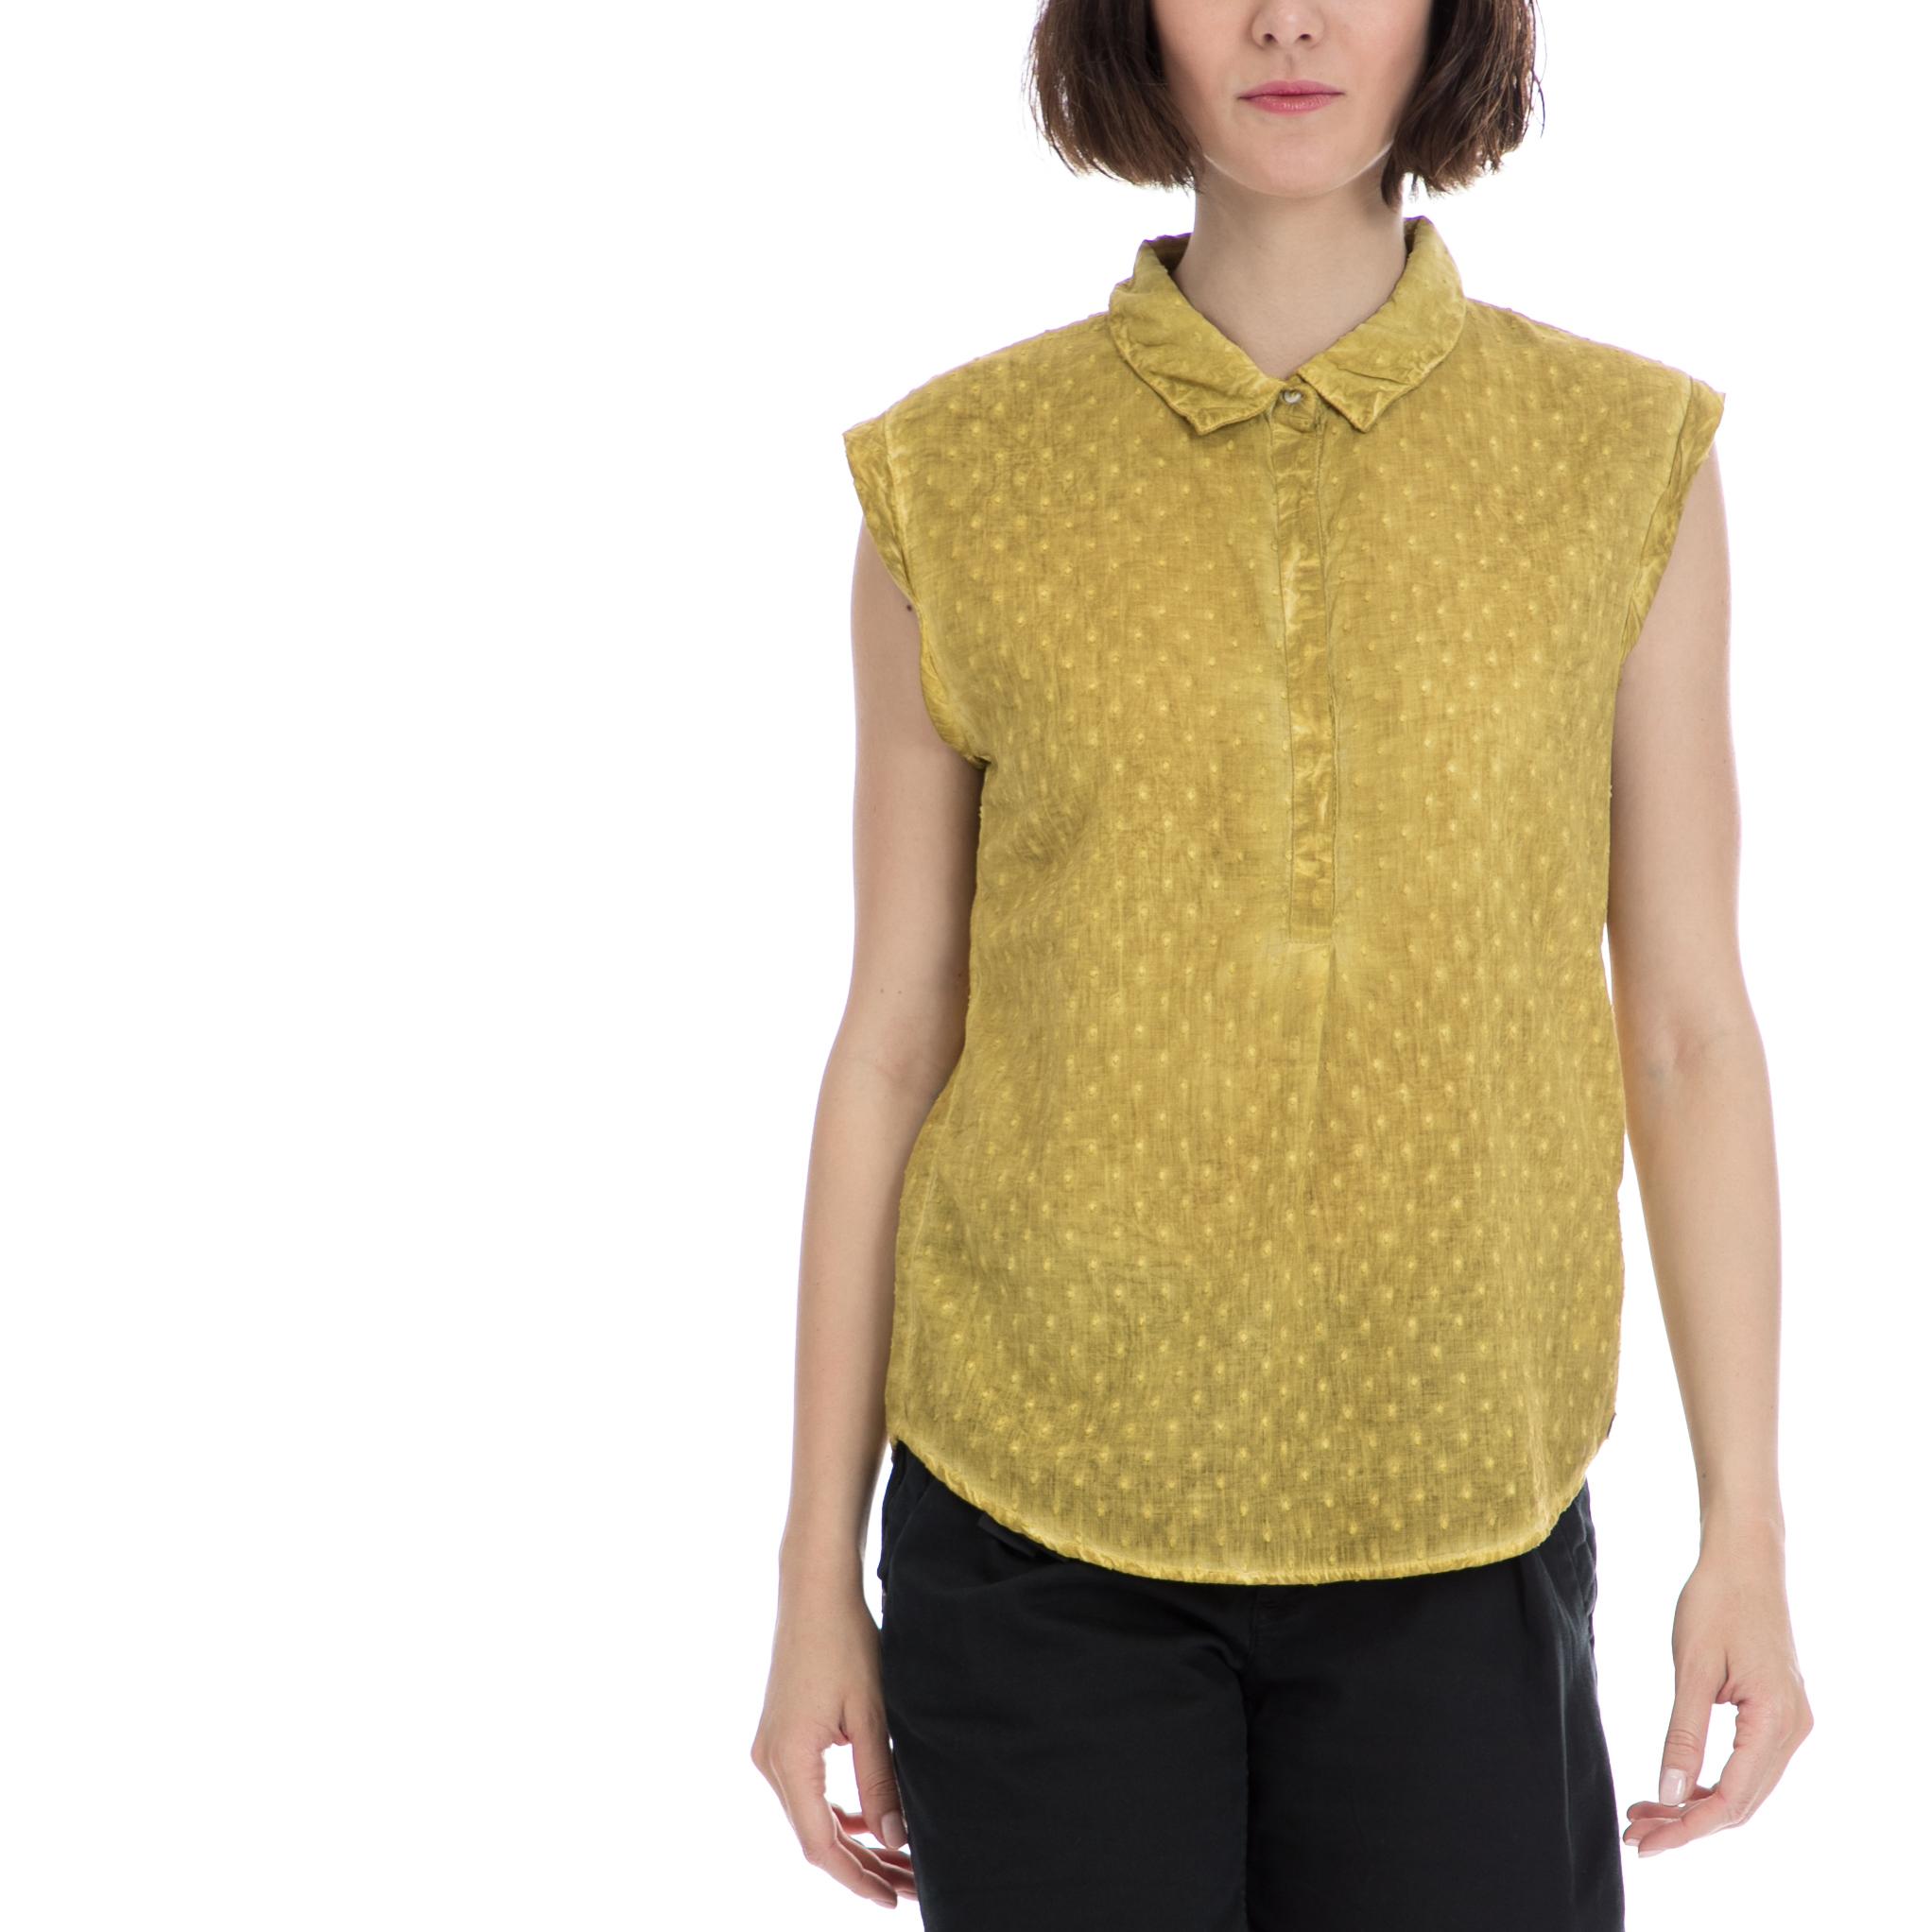 GARCIA JEANS – Γυναικείο τοπ Garcia Jeans κίτρινο